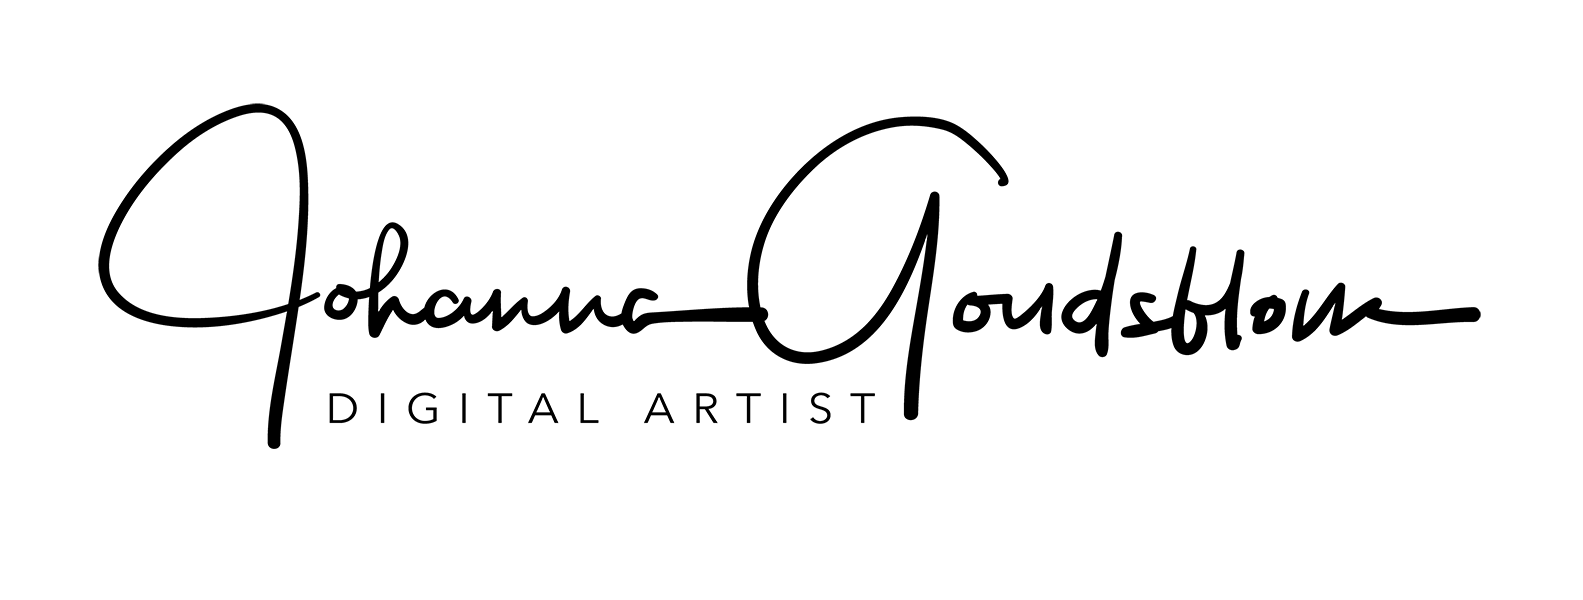 johanna G's Signature